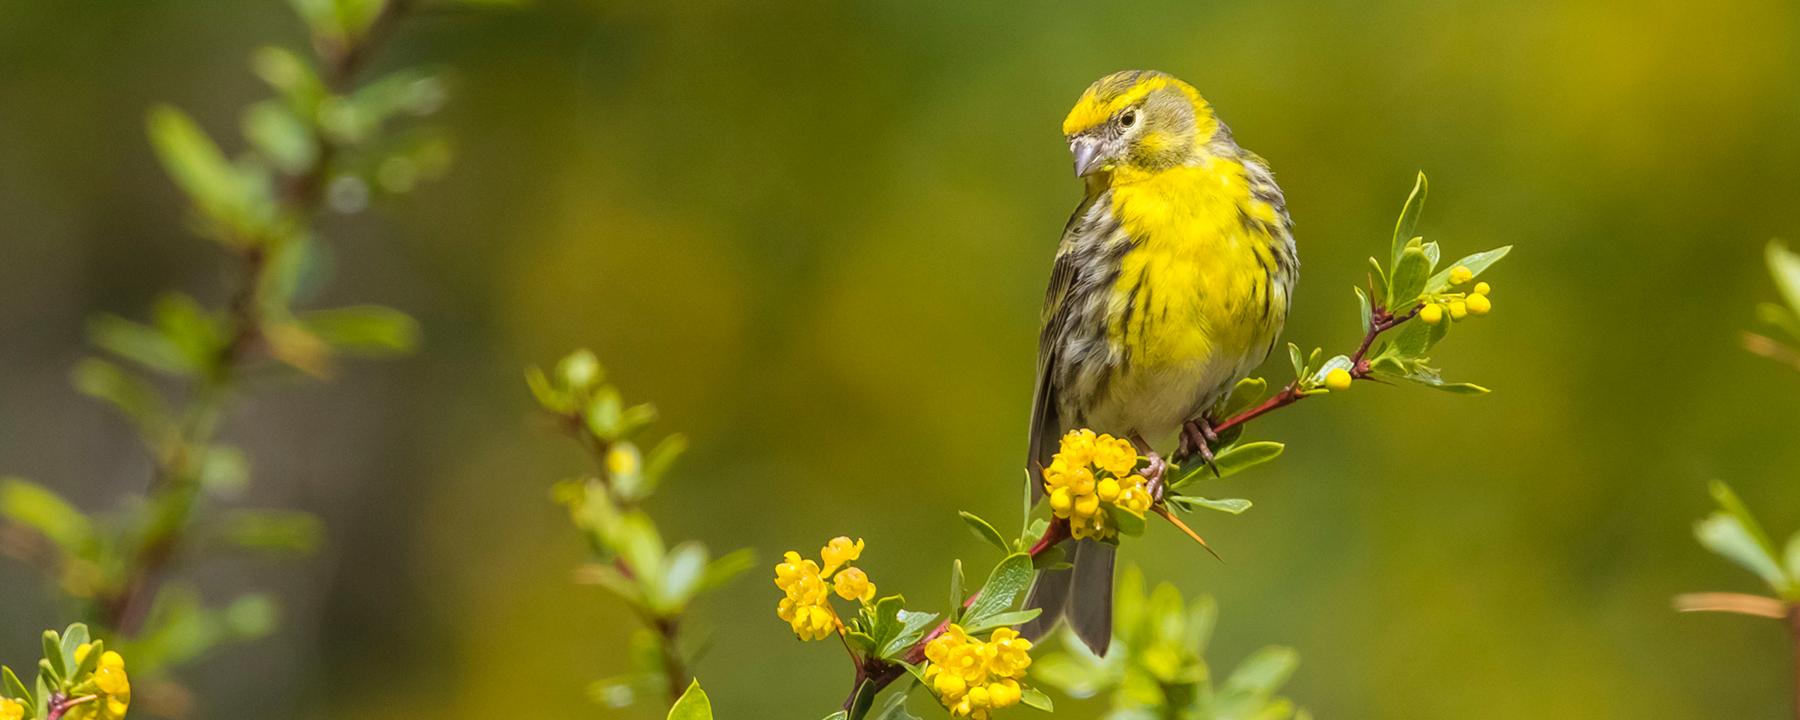 The Gene that Makes Female Birds Drab